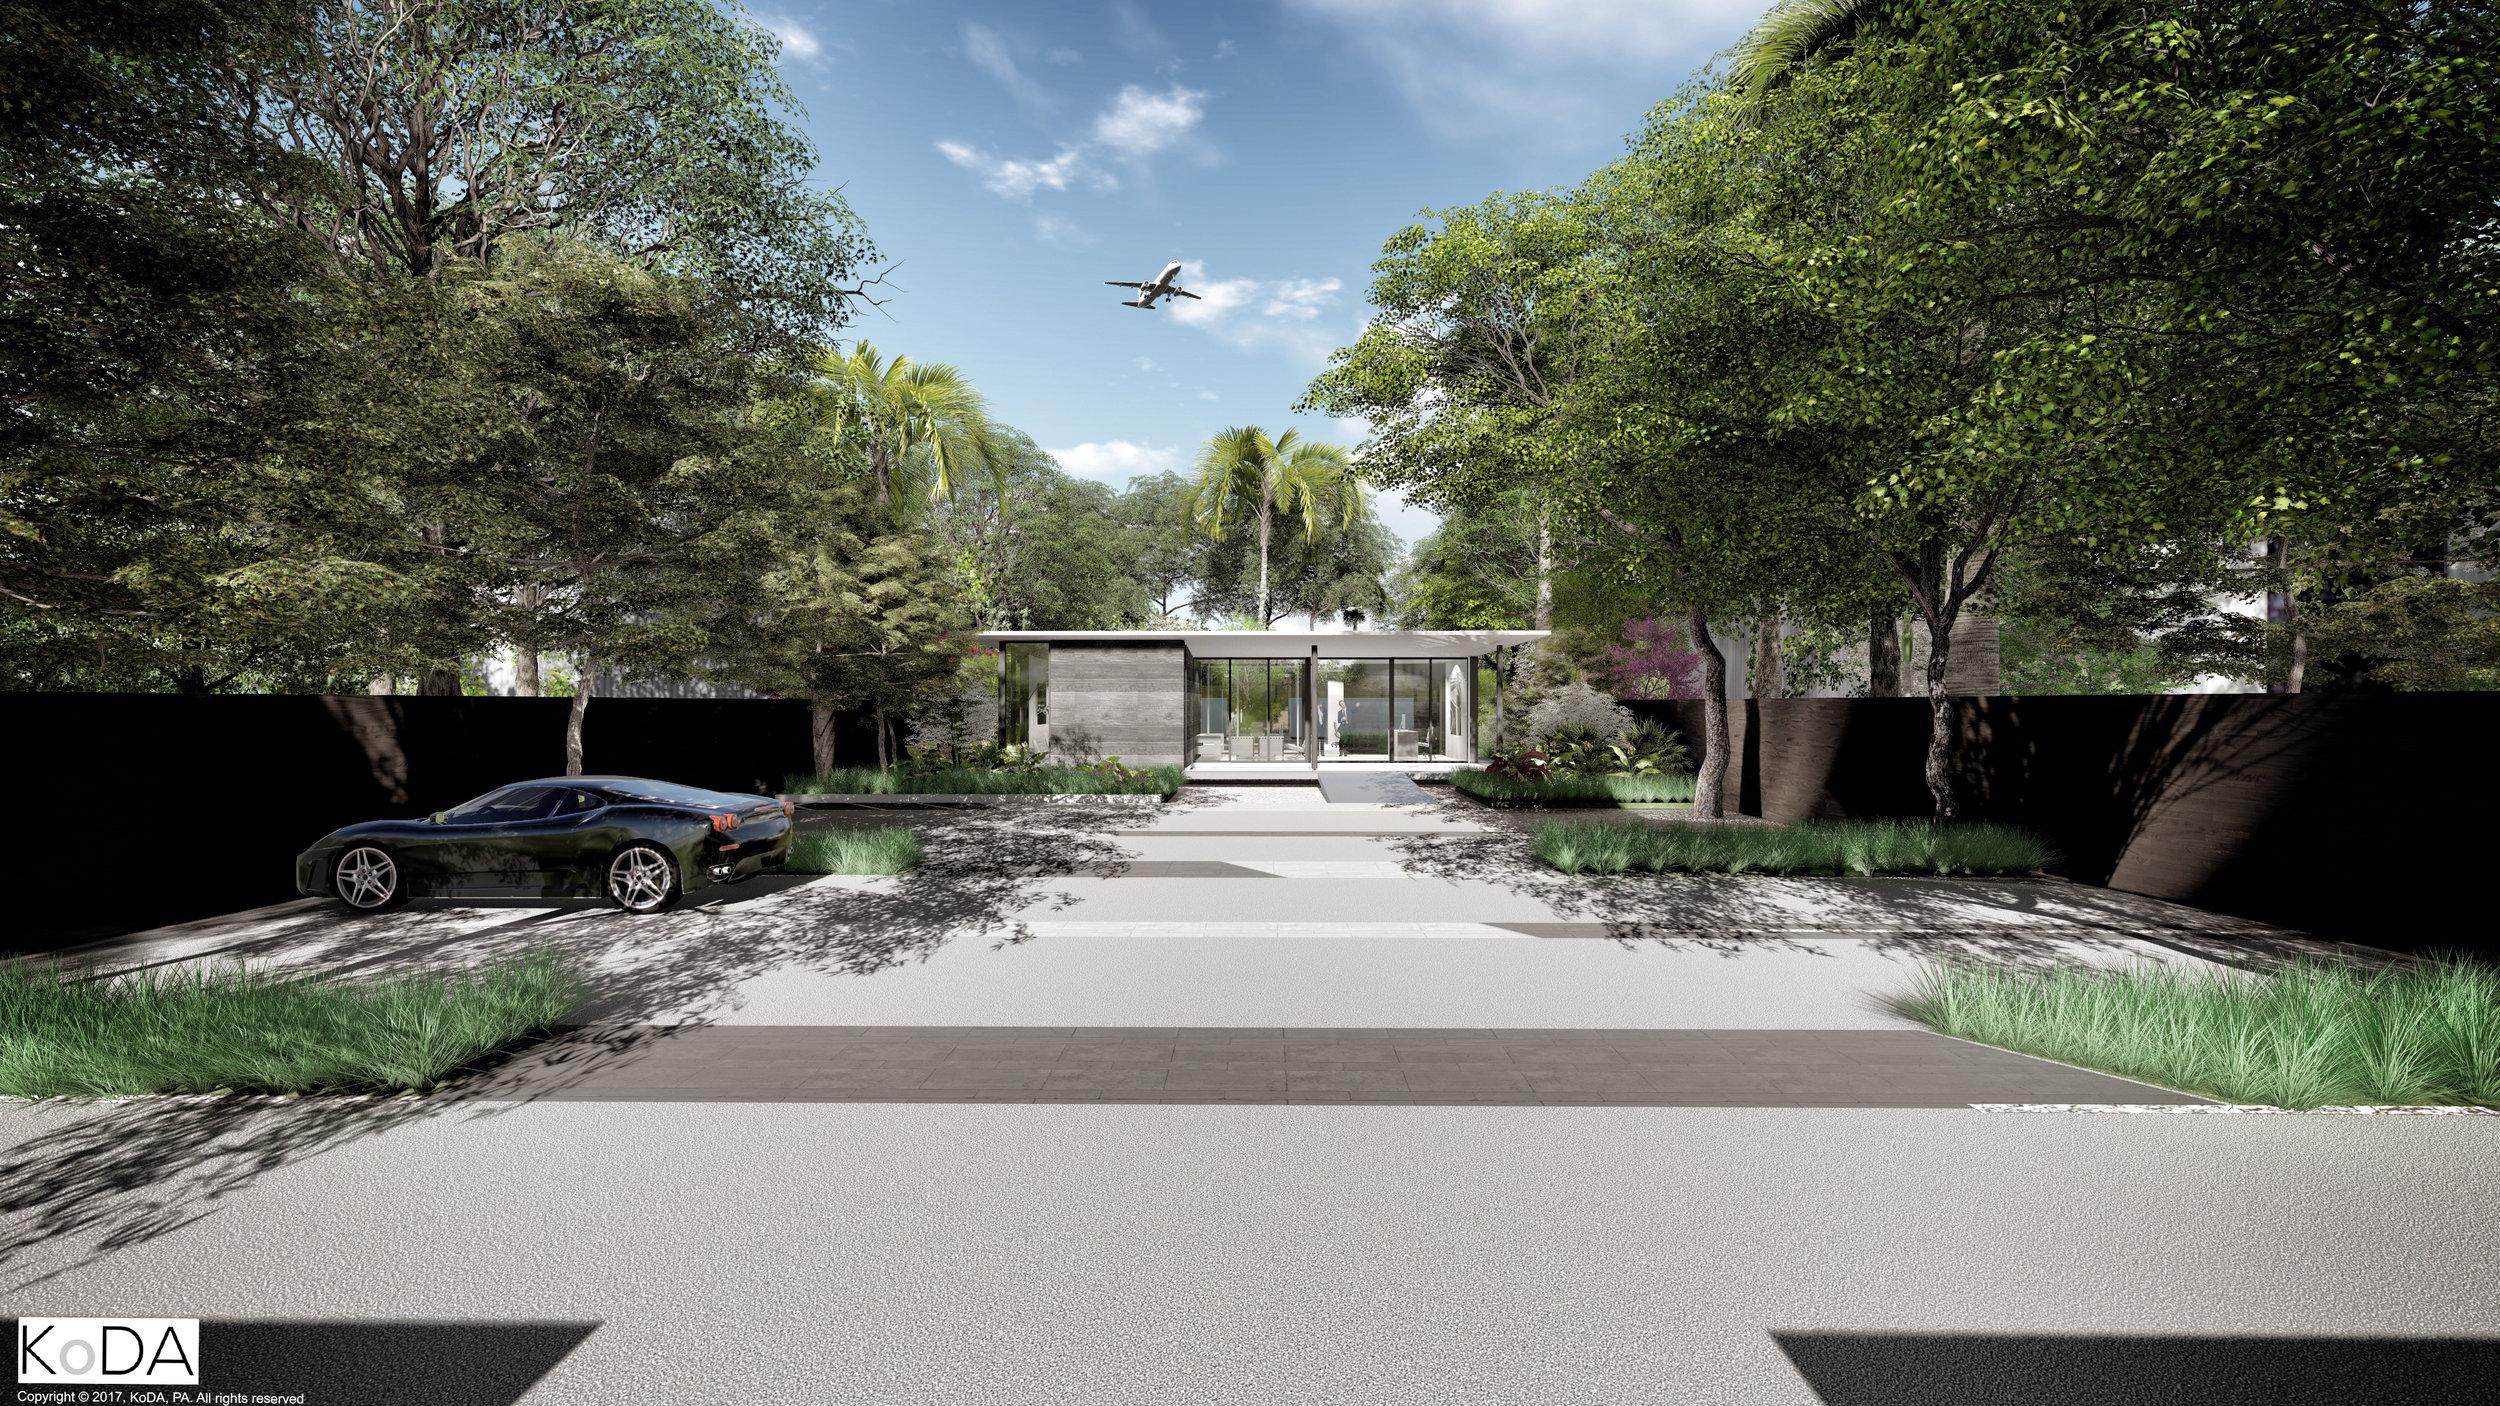 Aviation Design Center Fort Lauderdale Florida